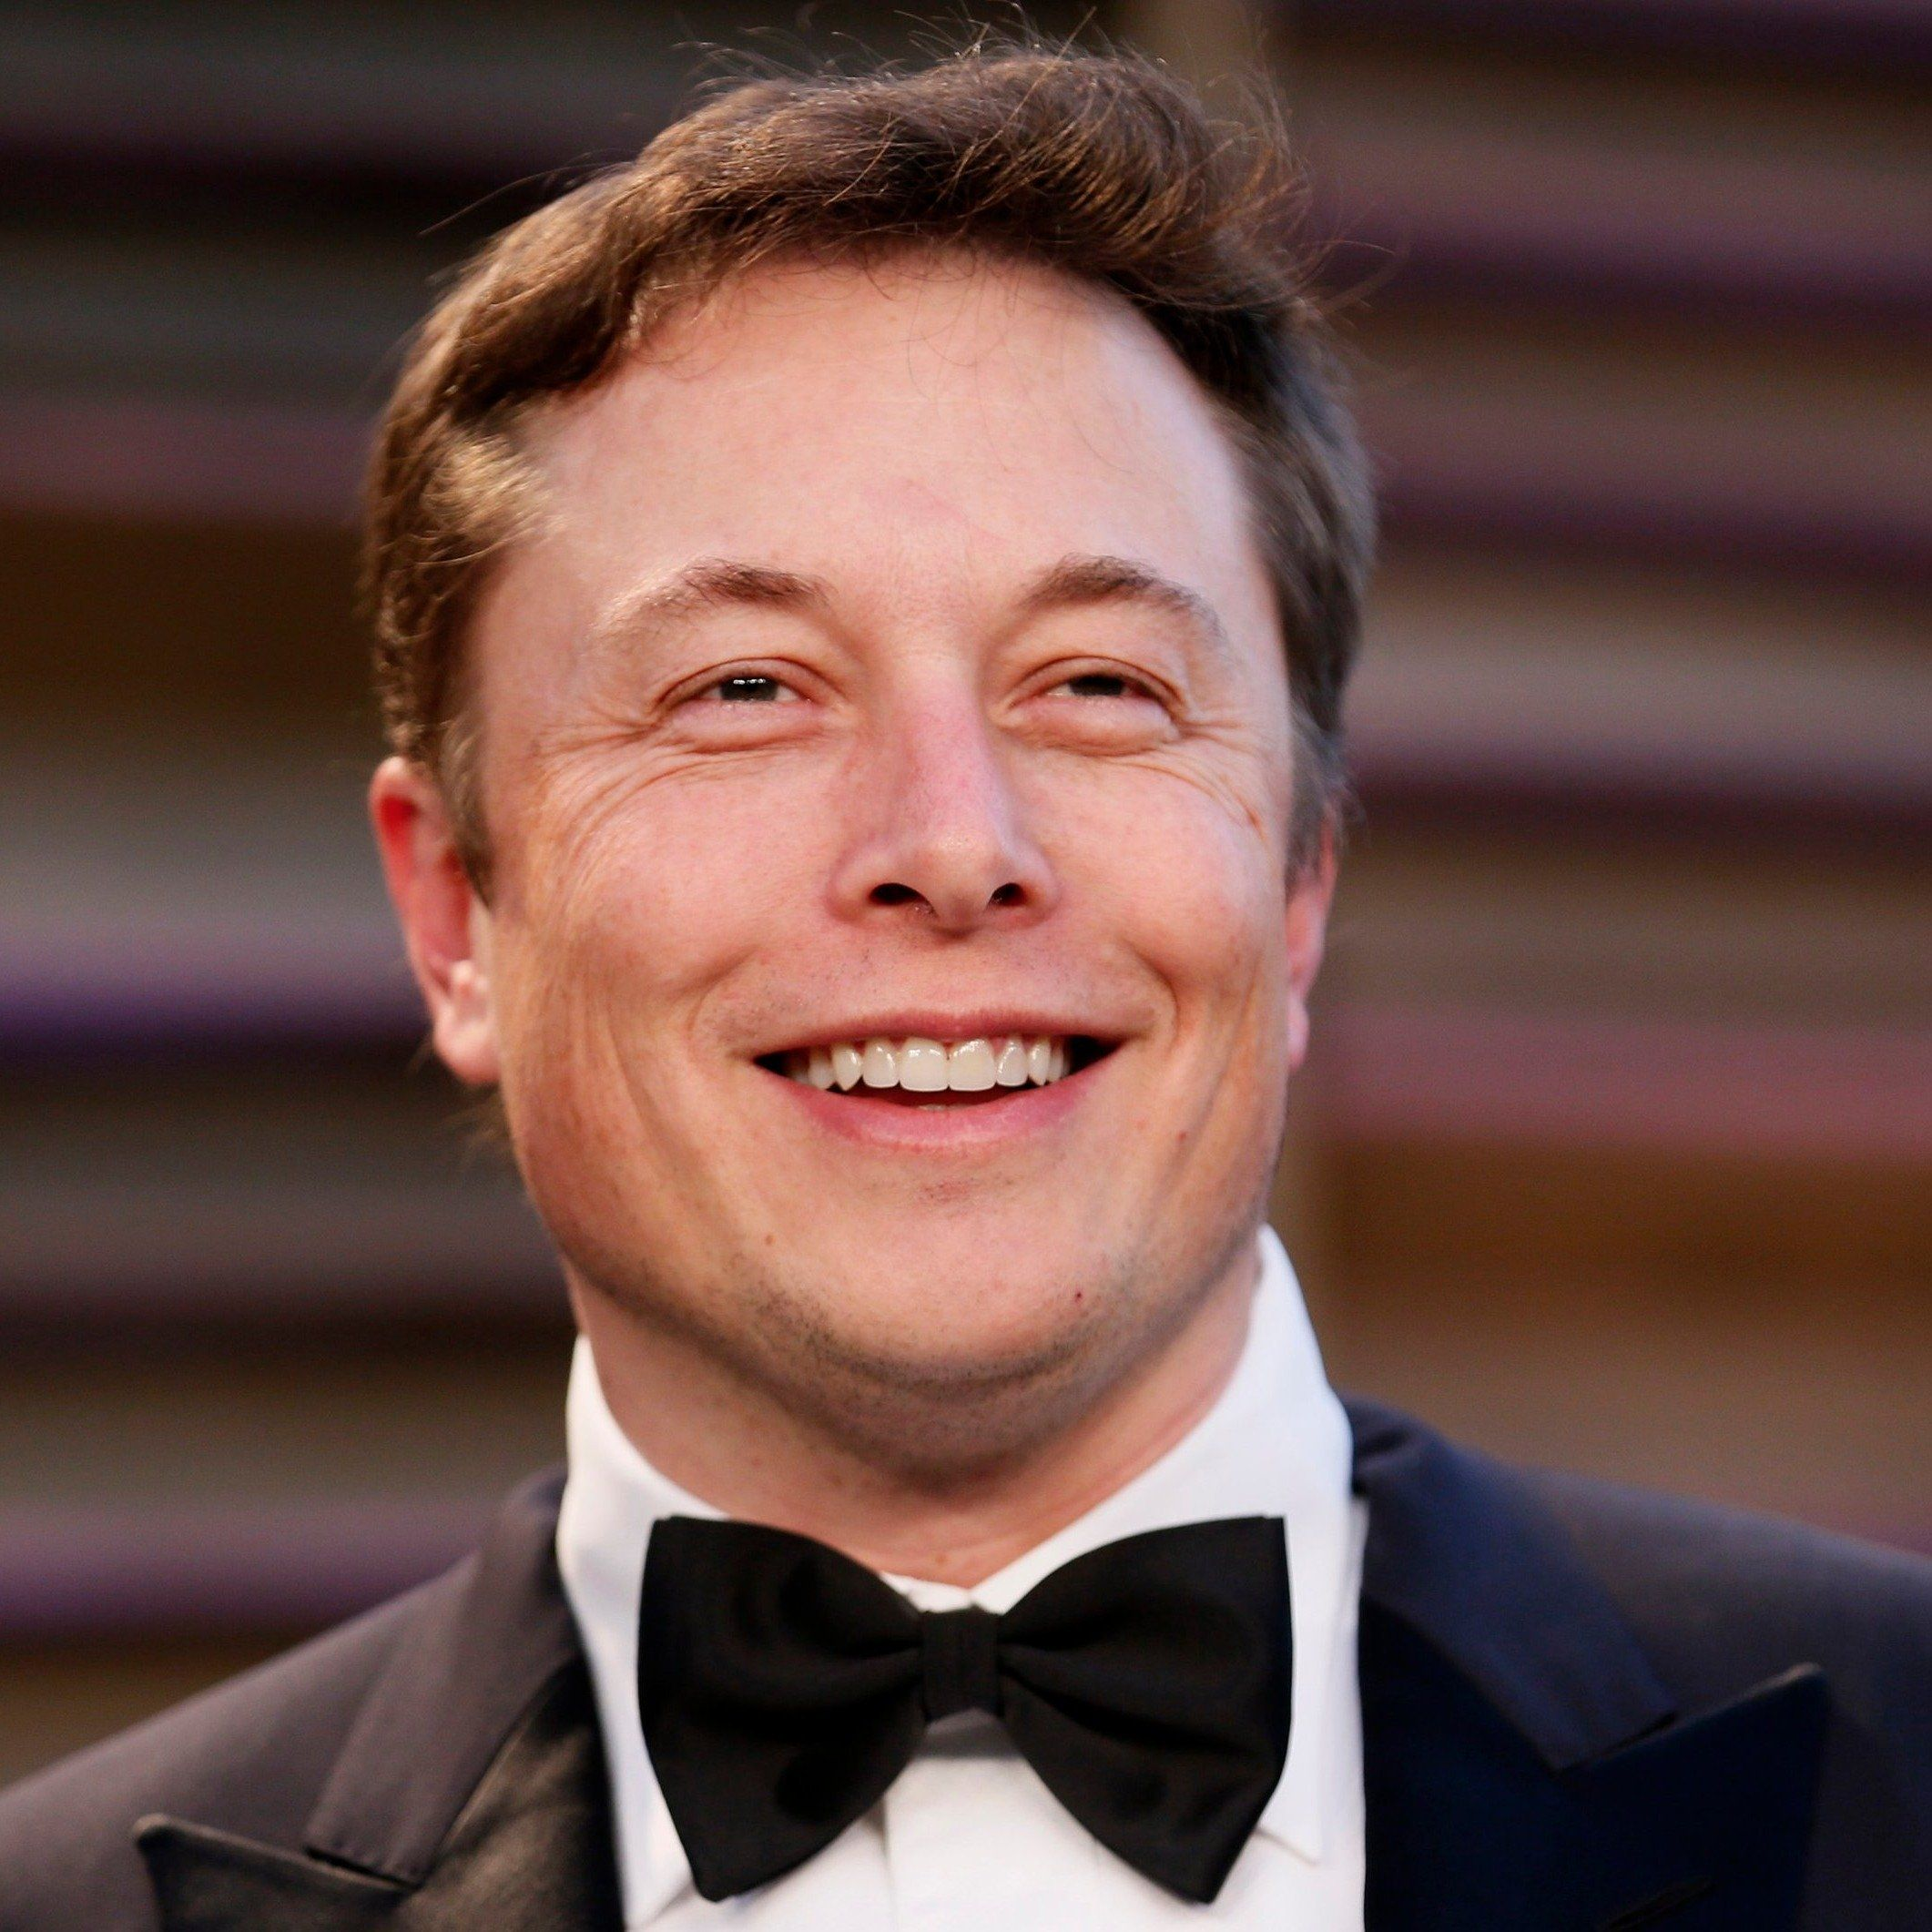 Billionaire entrepreneur elon musk elon musk elon musk